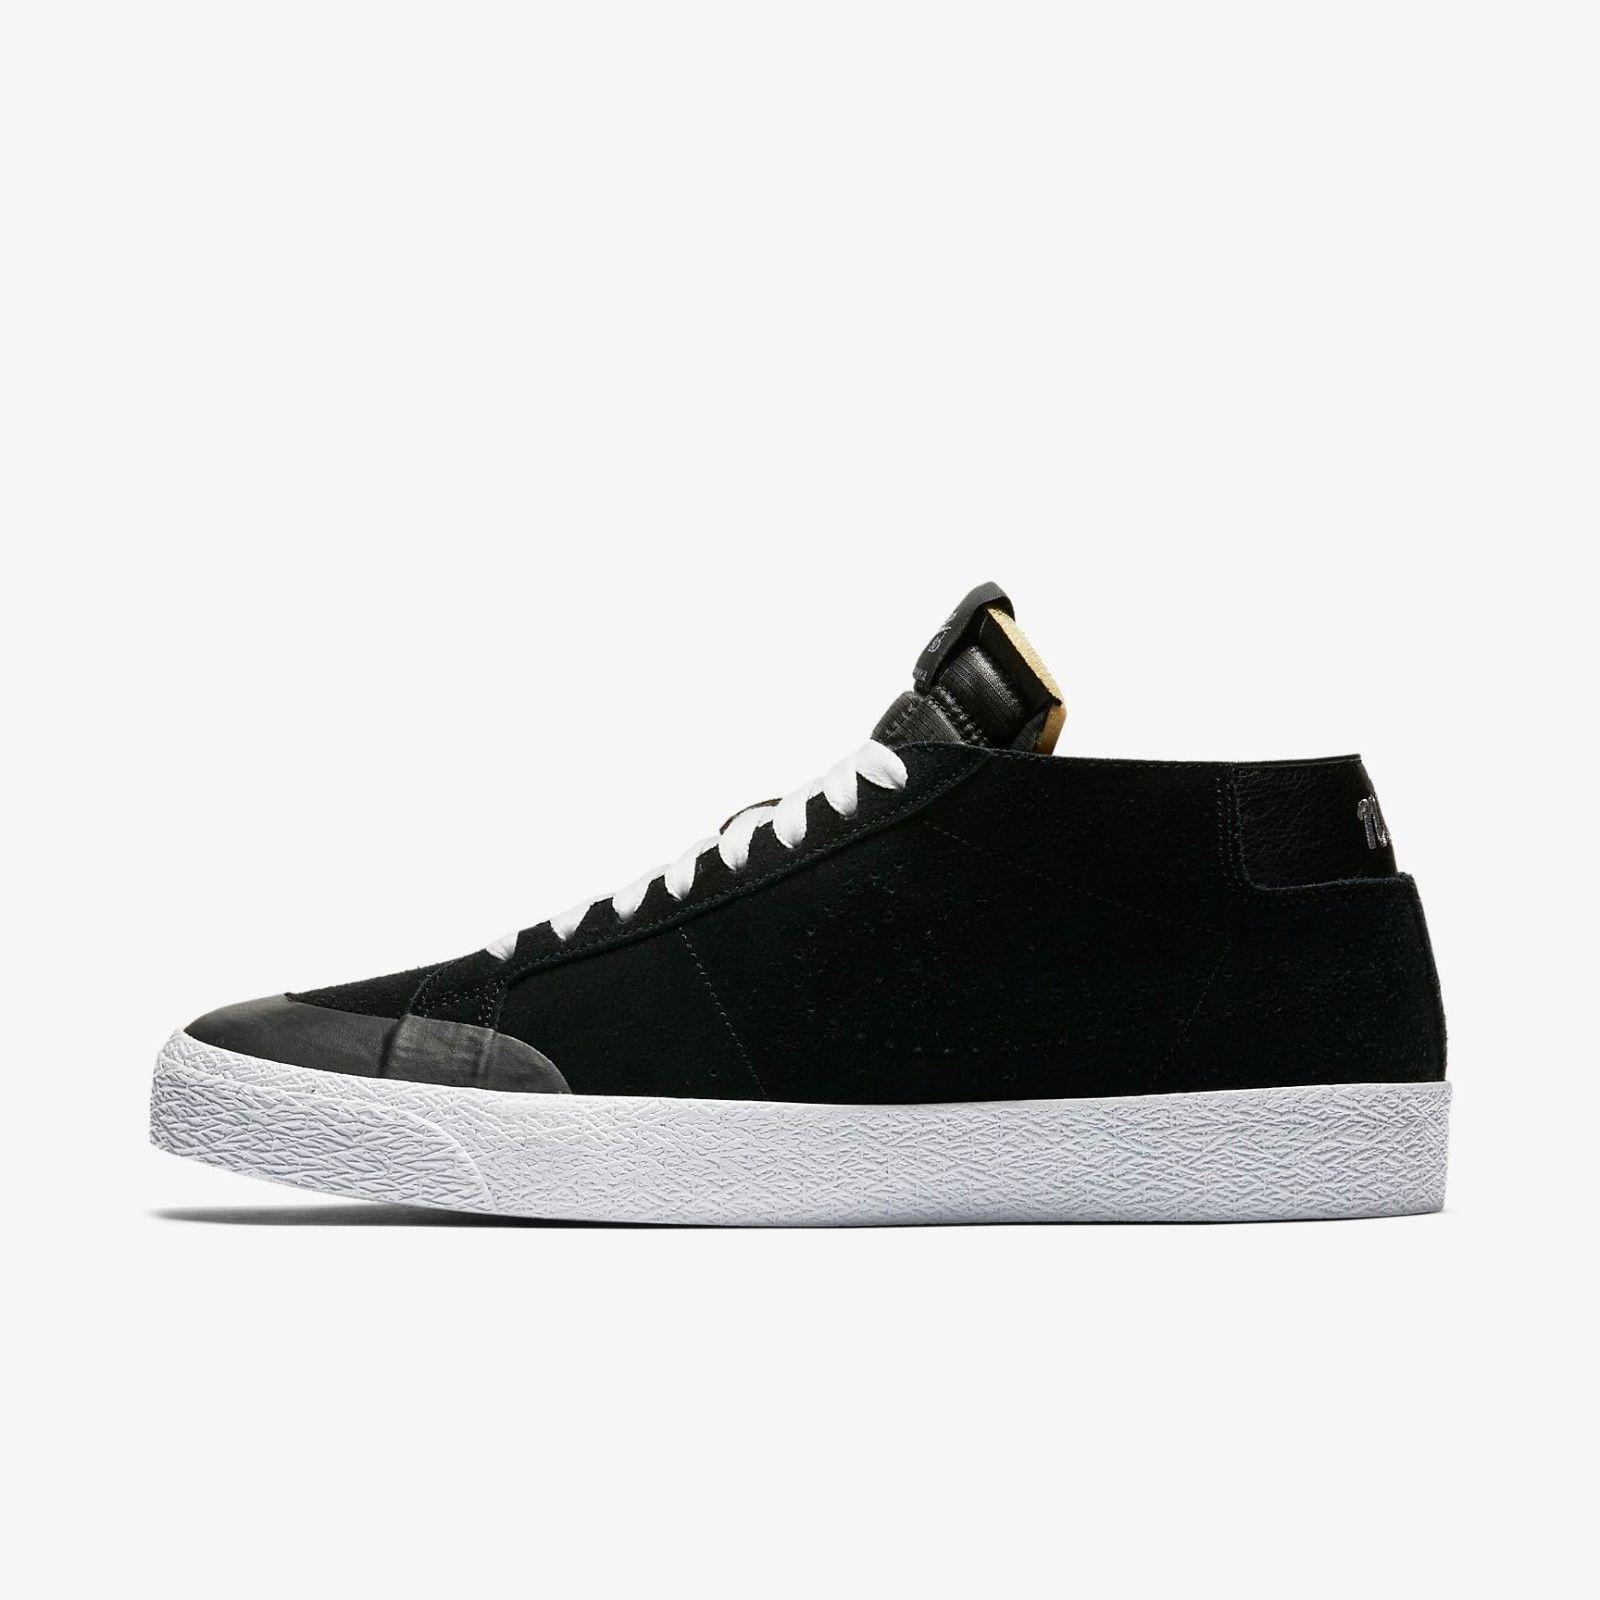 Nike SB Zoom Blazer Chukka XT Black Gunsmoke AH3366-001 Men's shoes Size 9   10